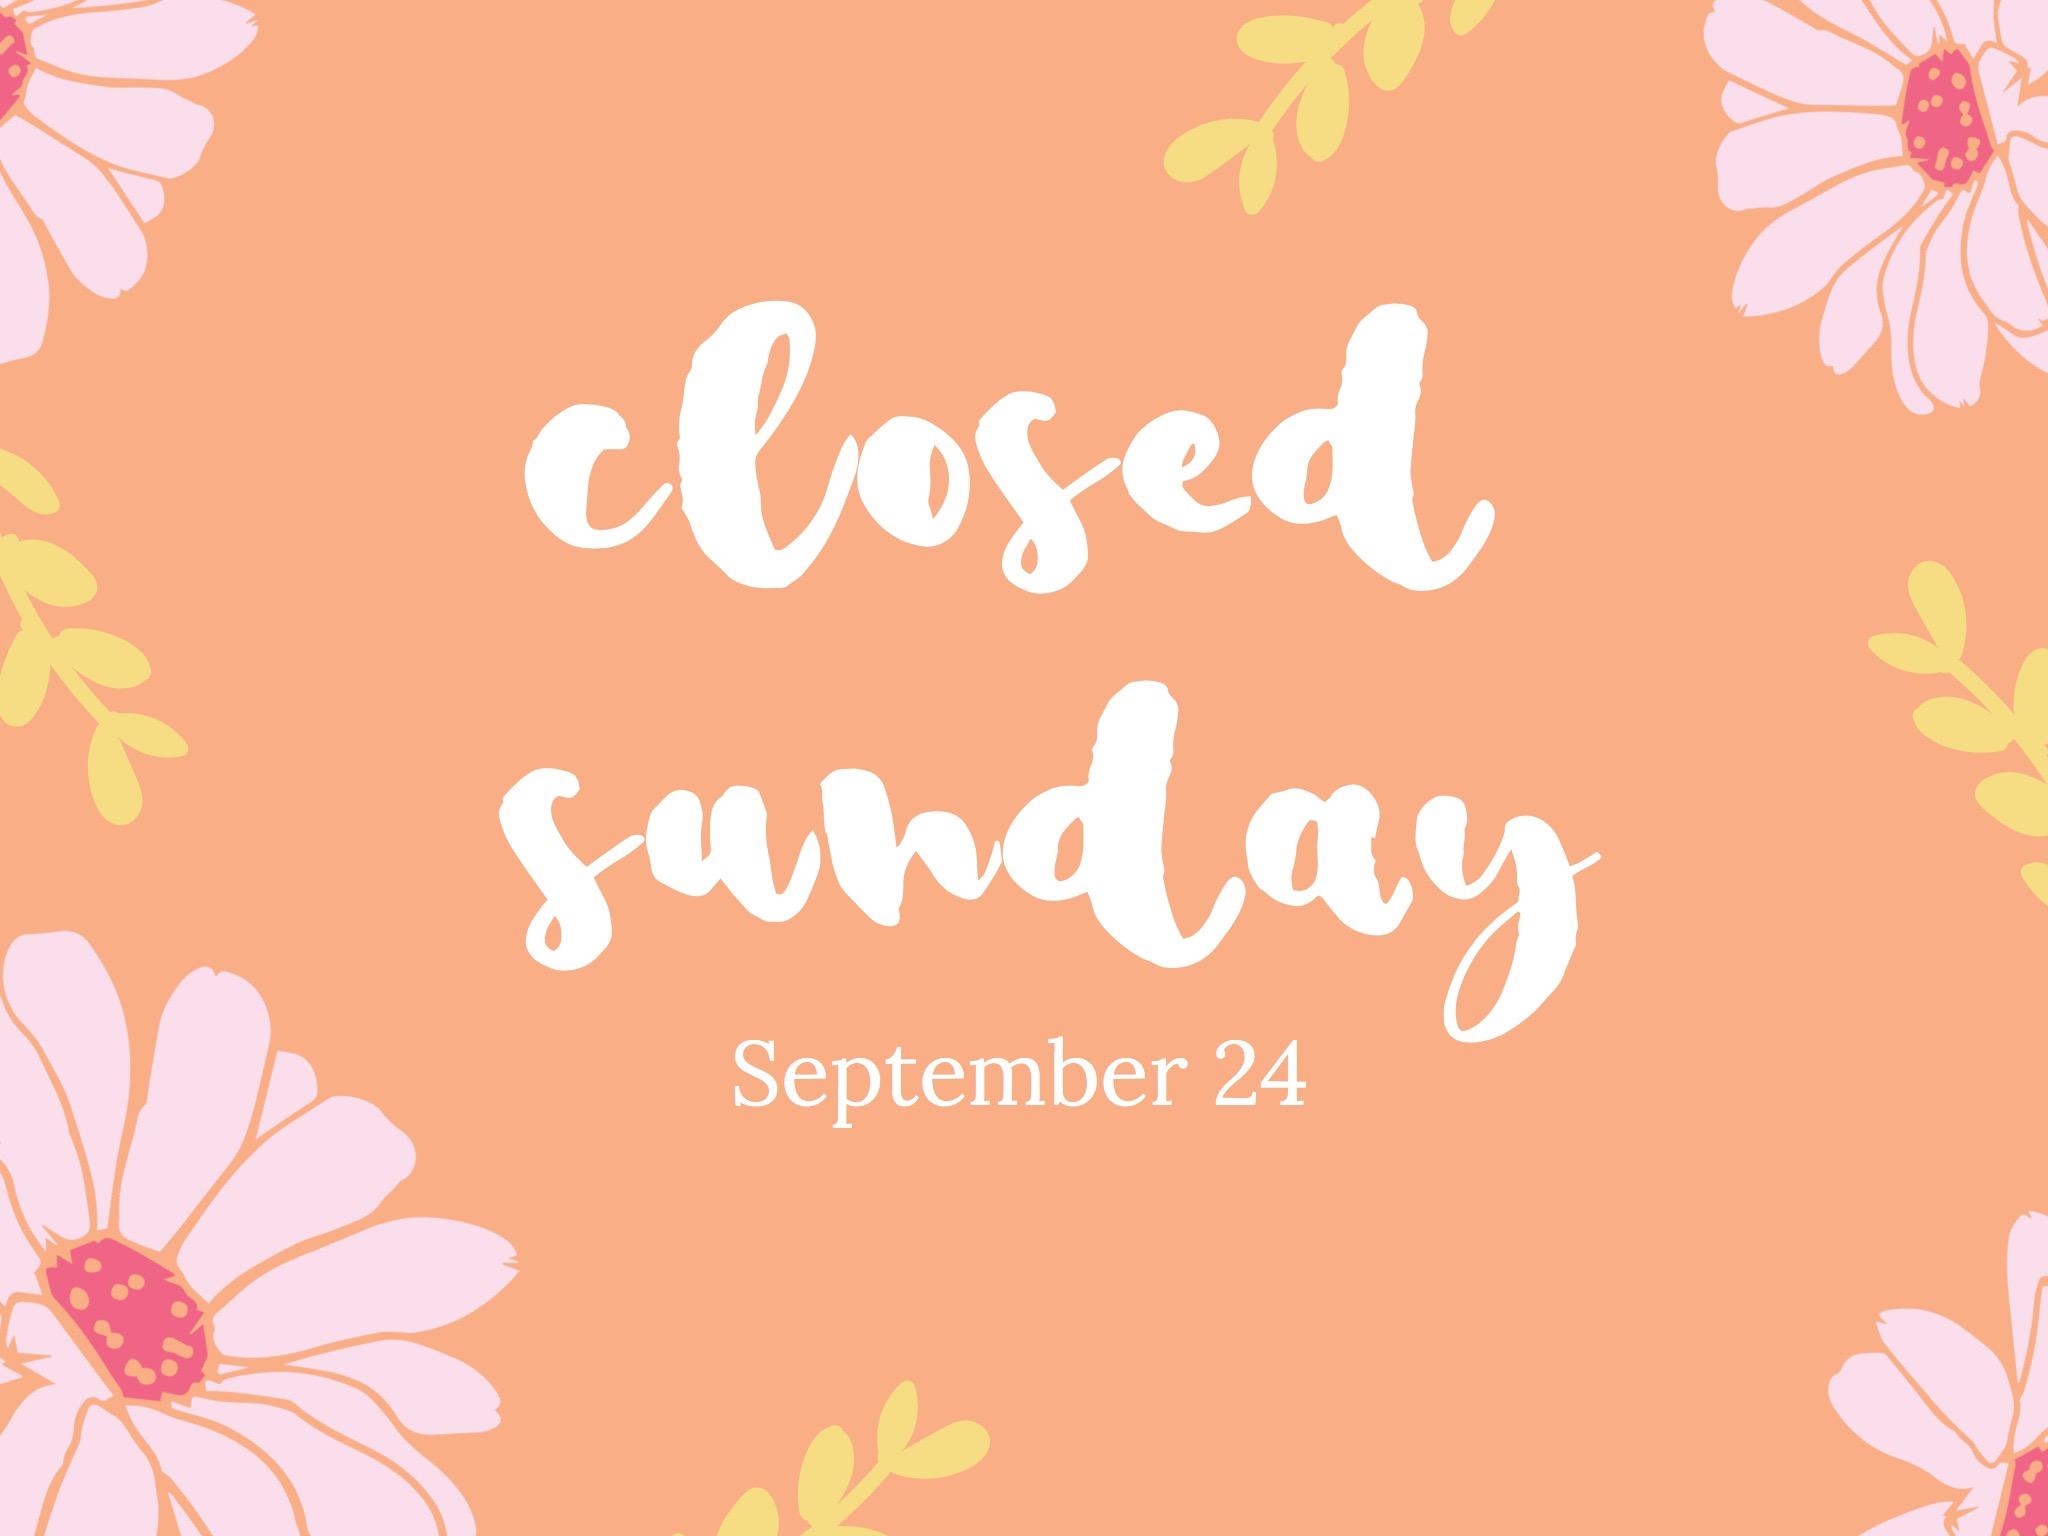 Closed Sunday.jpg